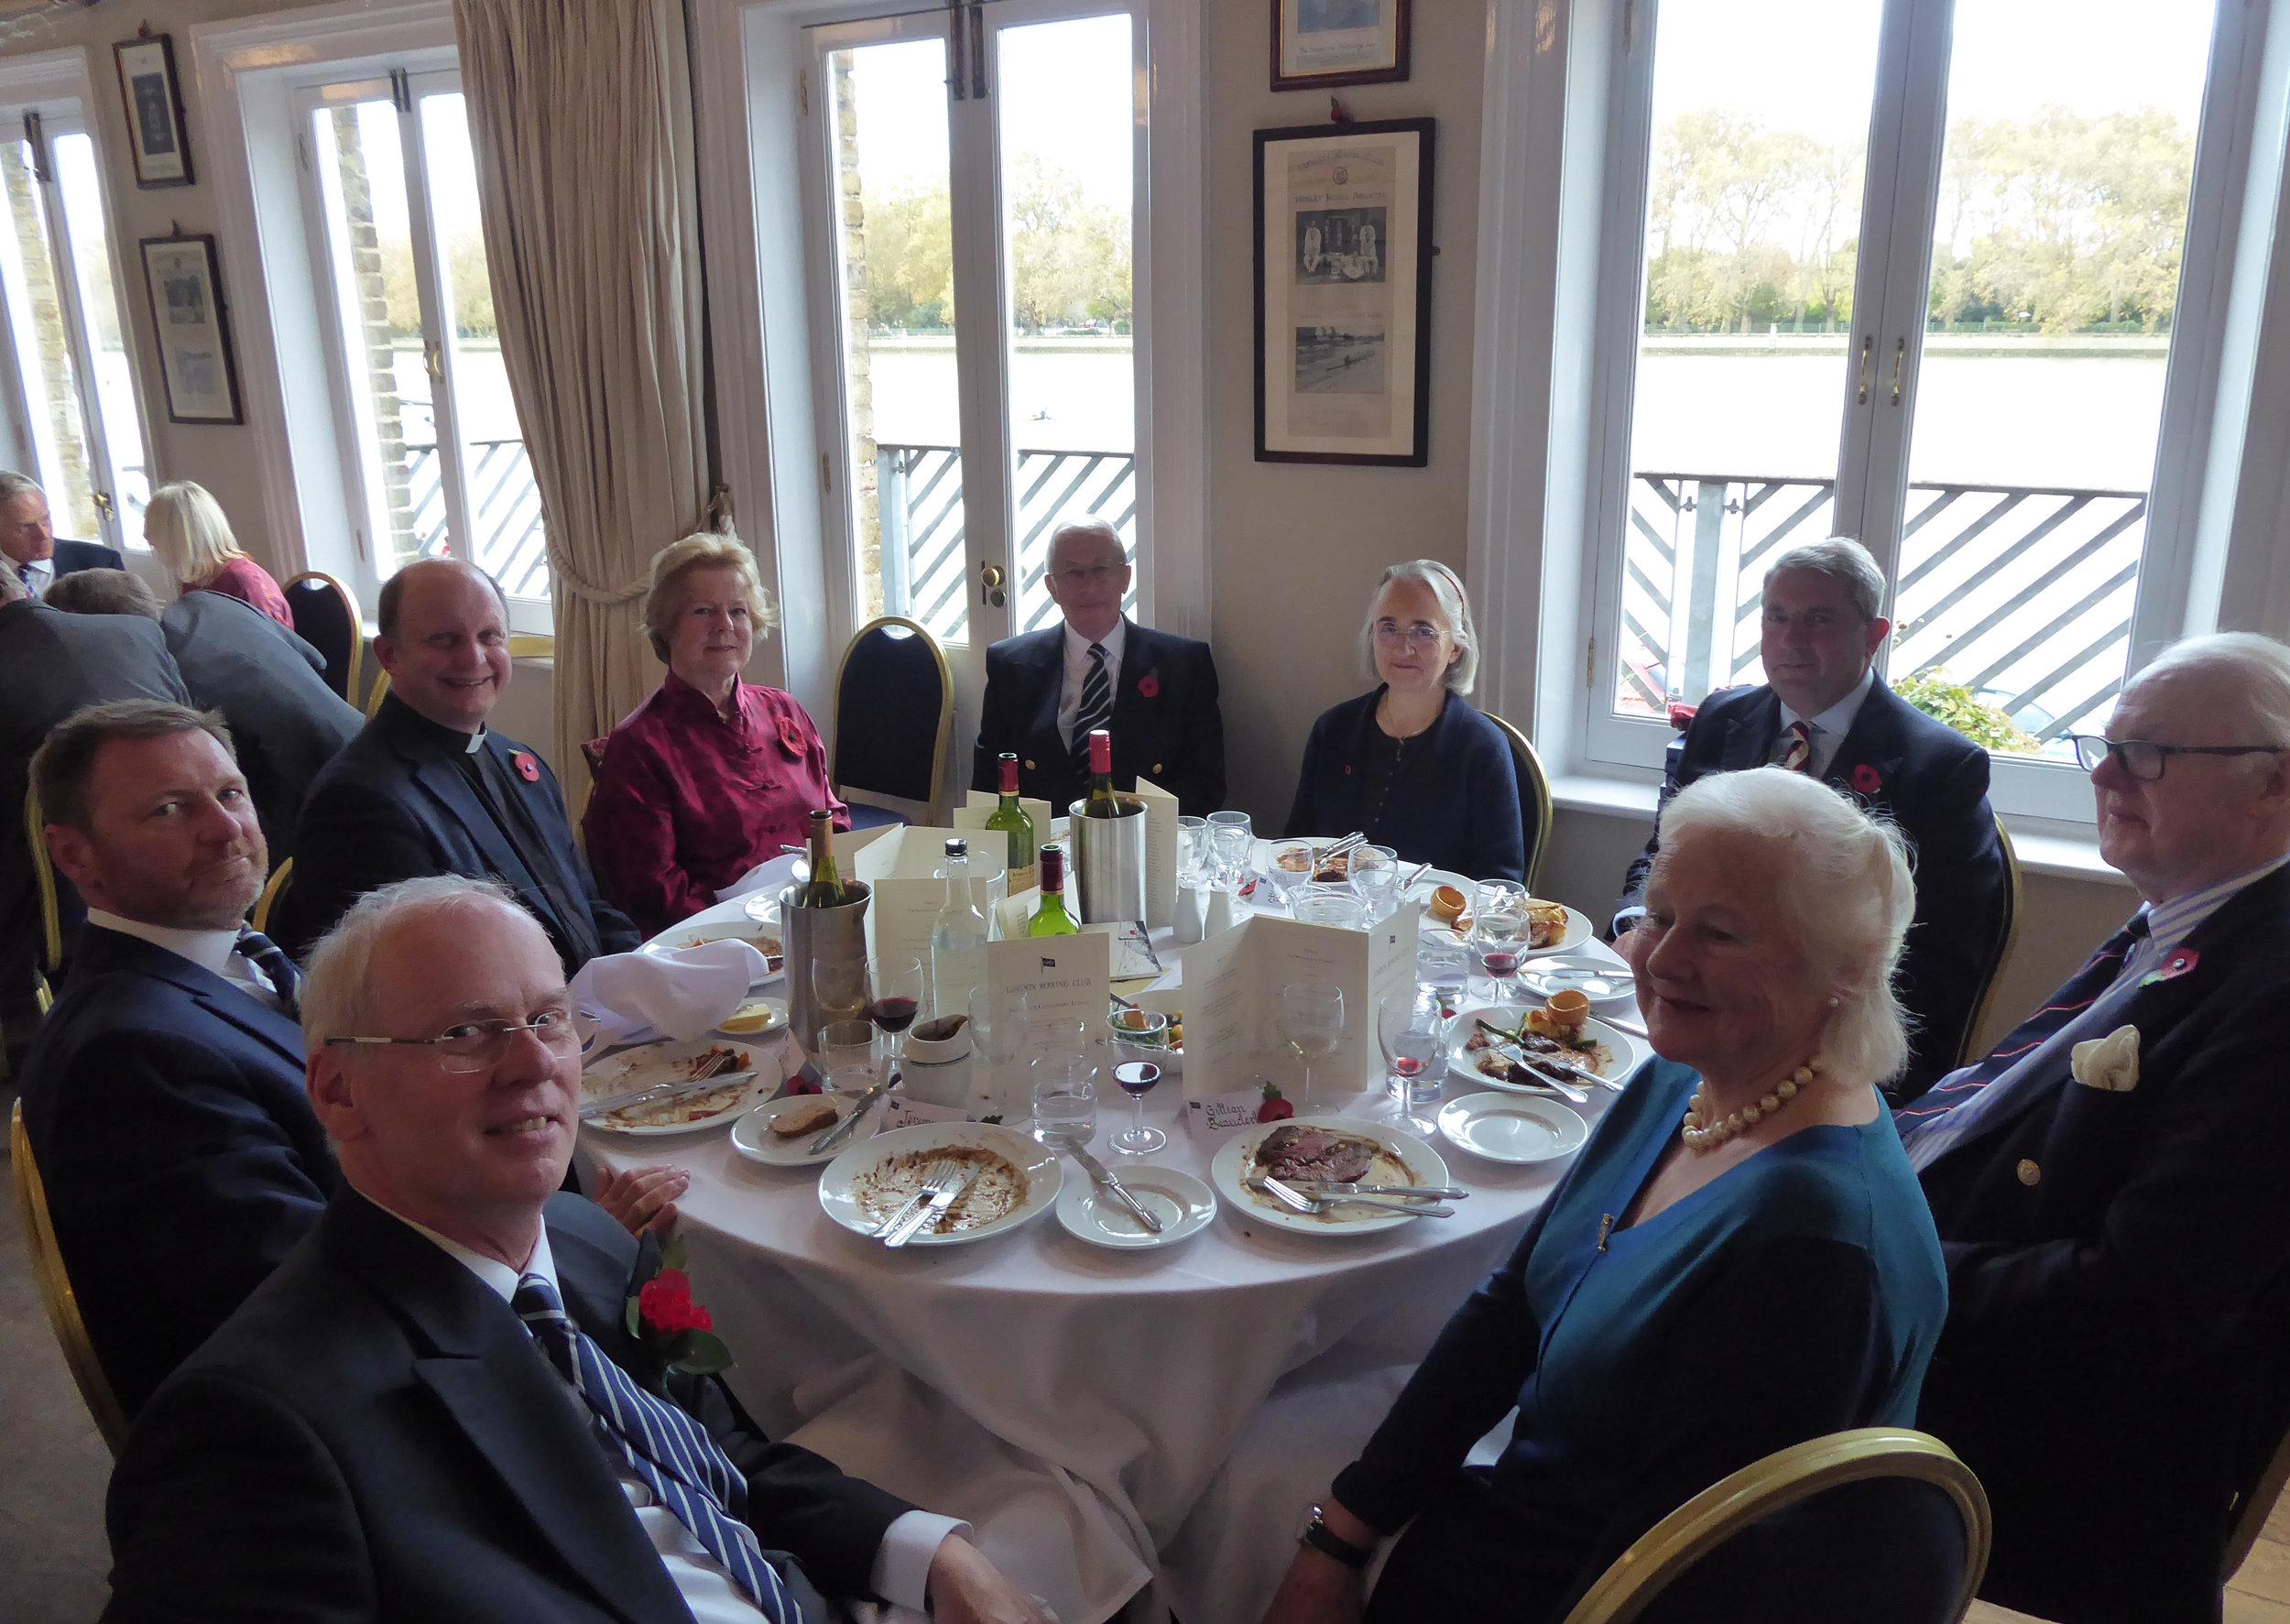 The top table at lunch, (from L) - Jeremy Hudson (Hon Sec); Ben Helm (V-P); the Revd John Whittaker; Mrs Susie Adams-Cairns; Mike Baldwin (President); Mrs Hilary Hudson; Ruaraidh Adams-Cairns; Peter Beauclerk-Dewar and Gillian Beauclerk (grandchildren of one of the 50 fallen, J E Dewar).